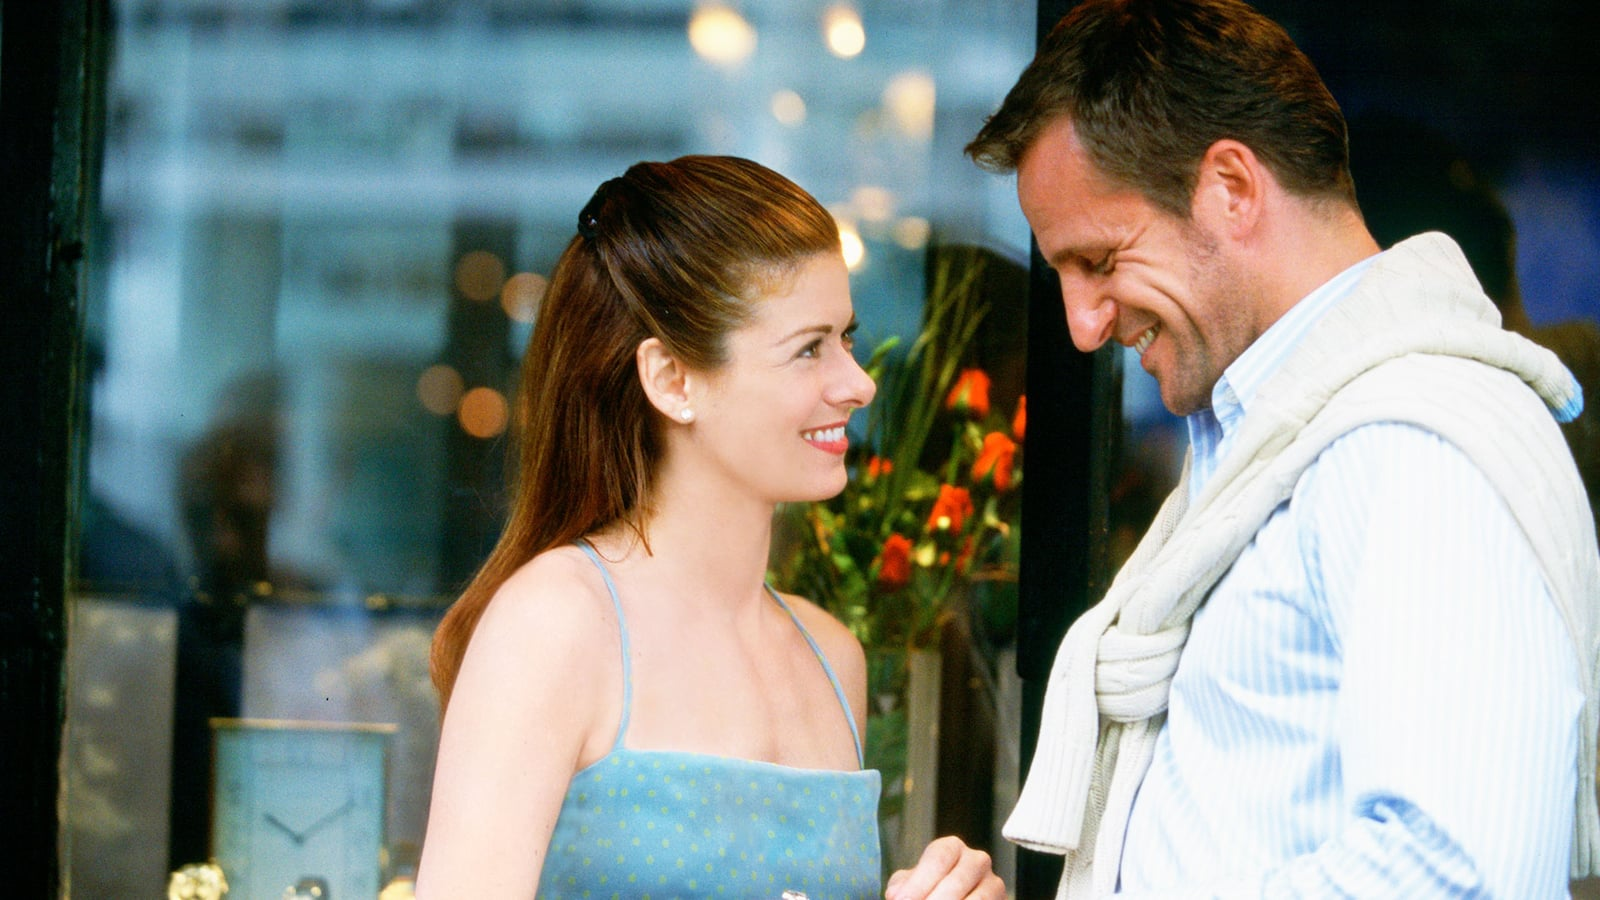 the-wedding-date-2005